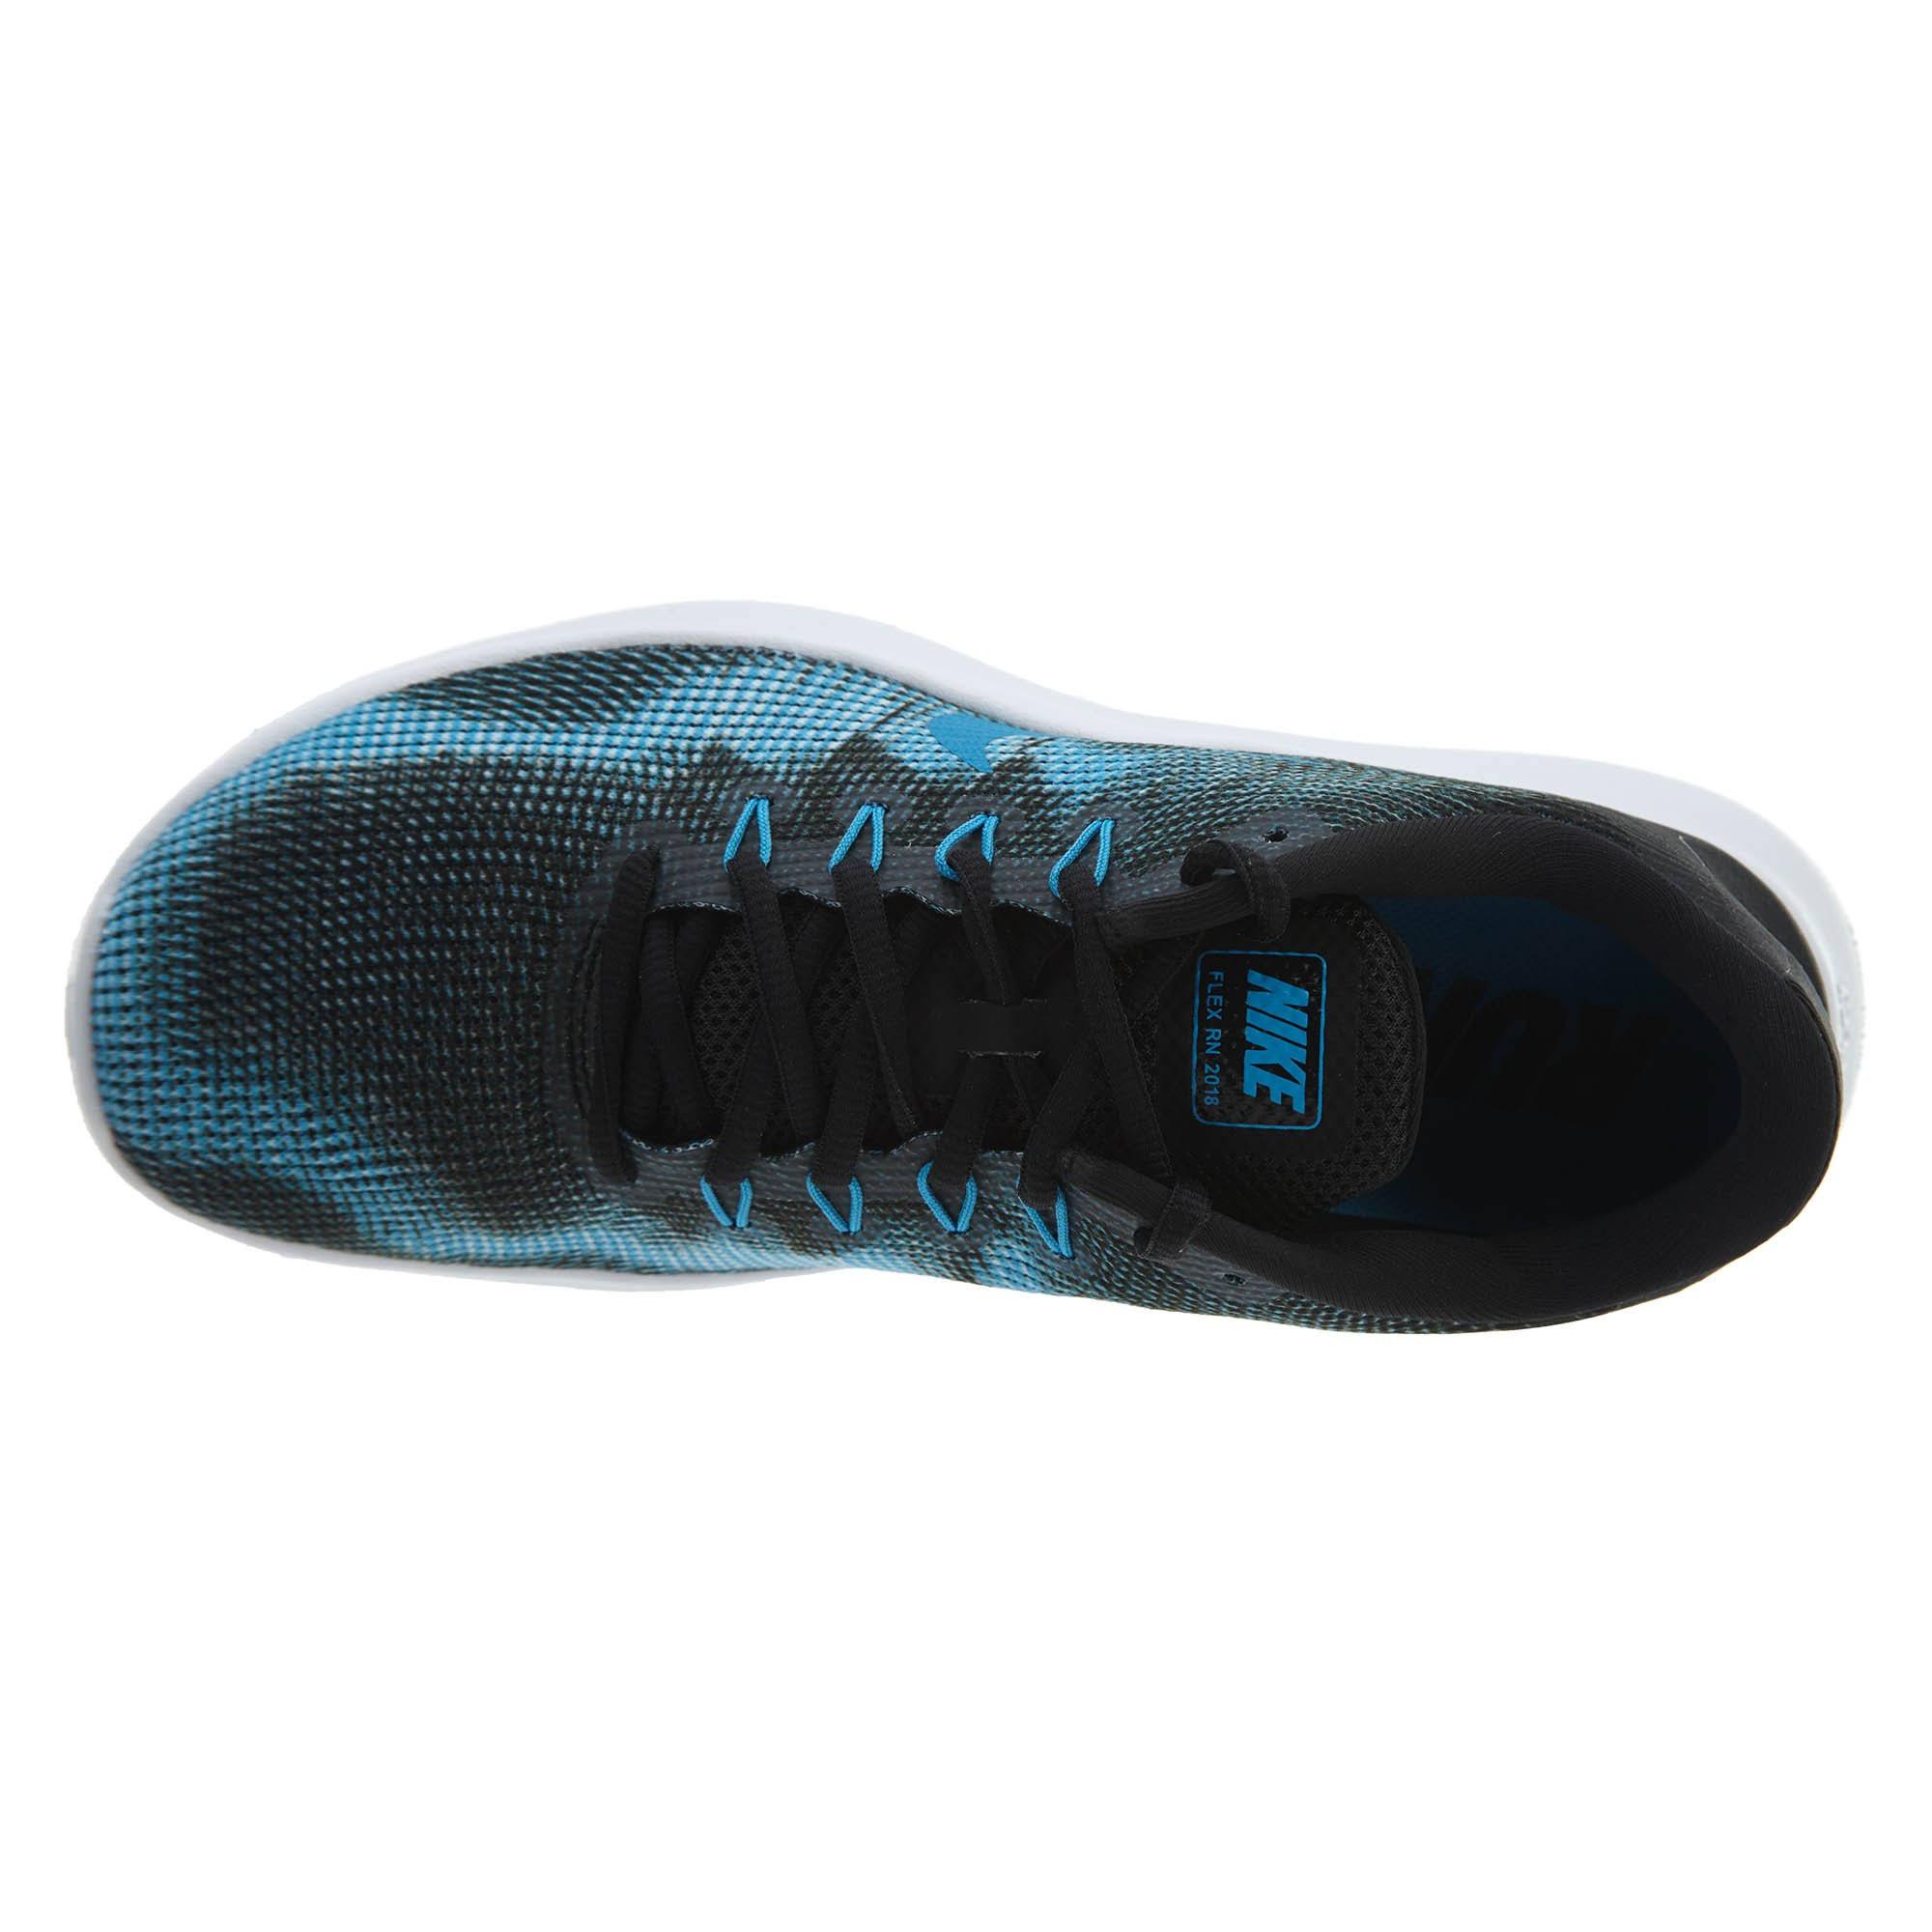 Nike weiß Männer Schwarz Rn Flex Äquator Aa7397 Blau Style 004 2018 vqwrWvxE0t